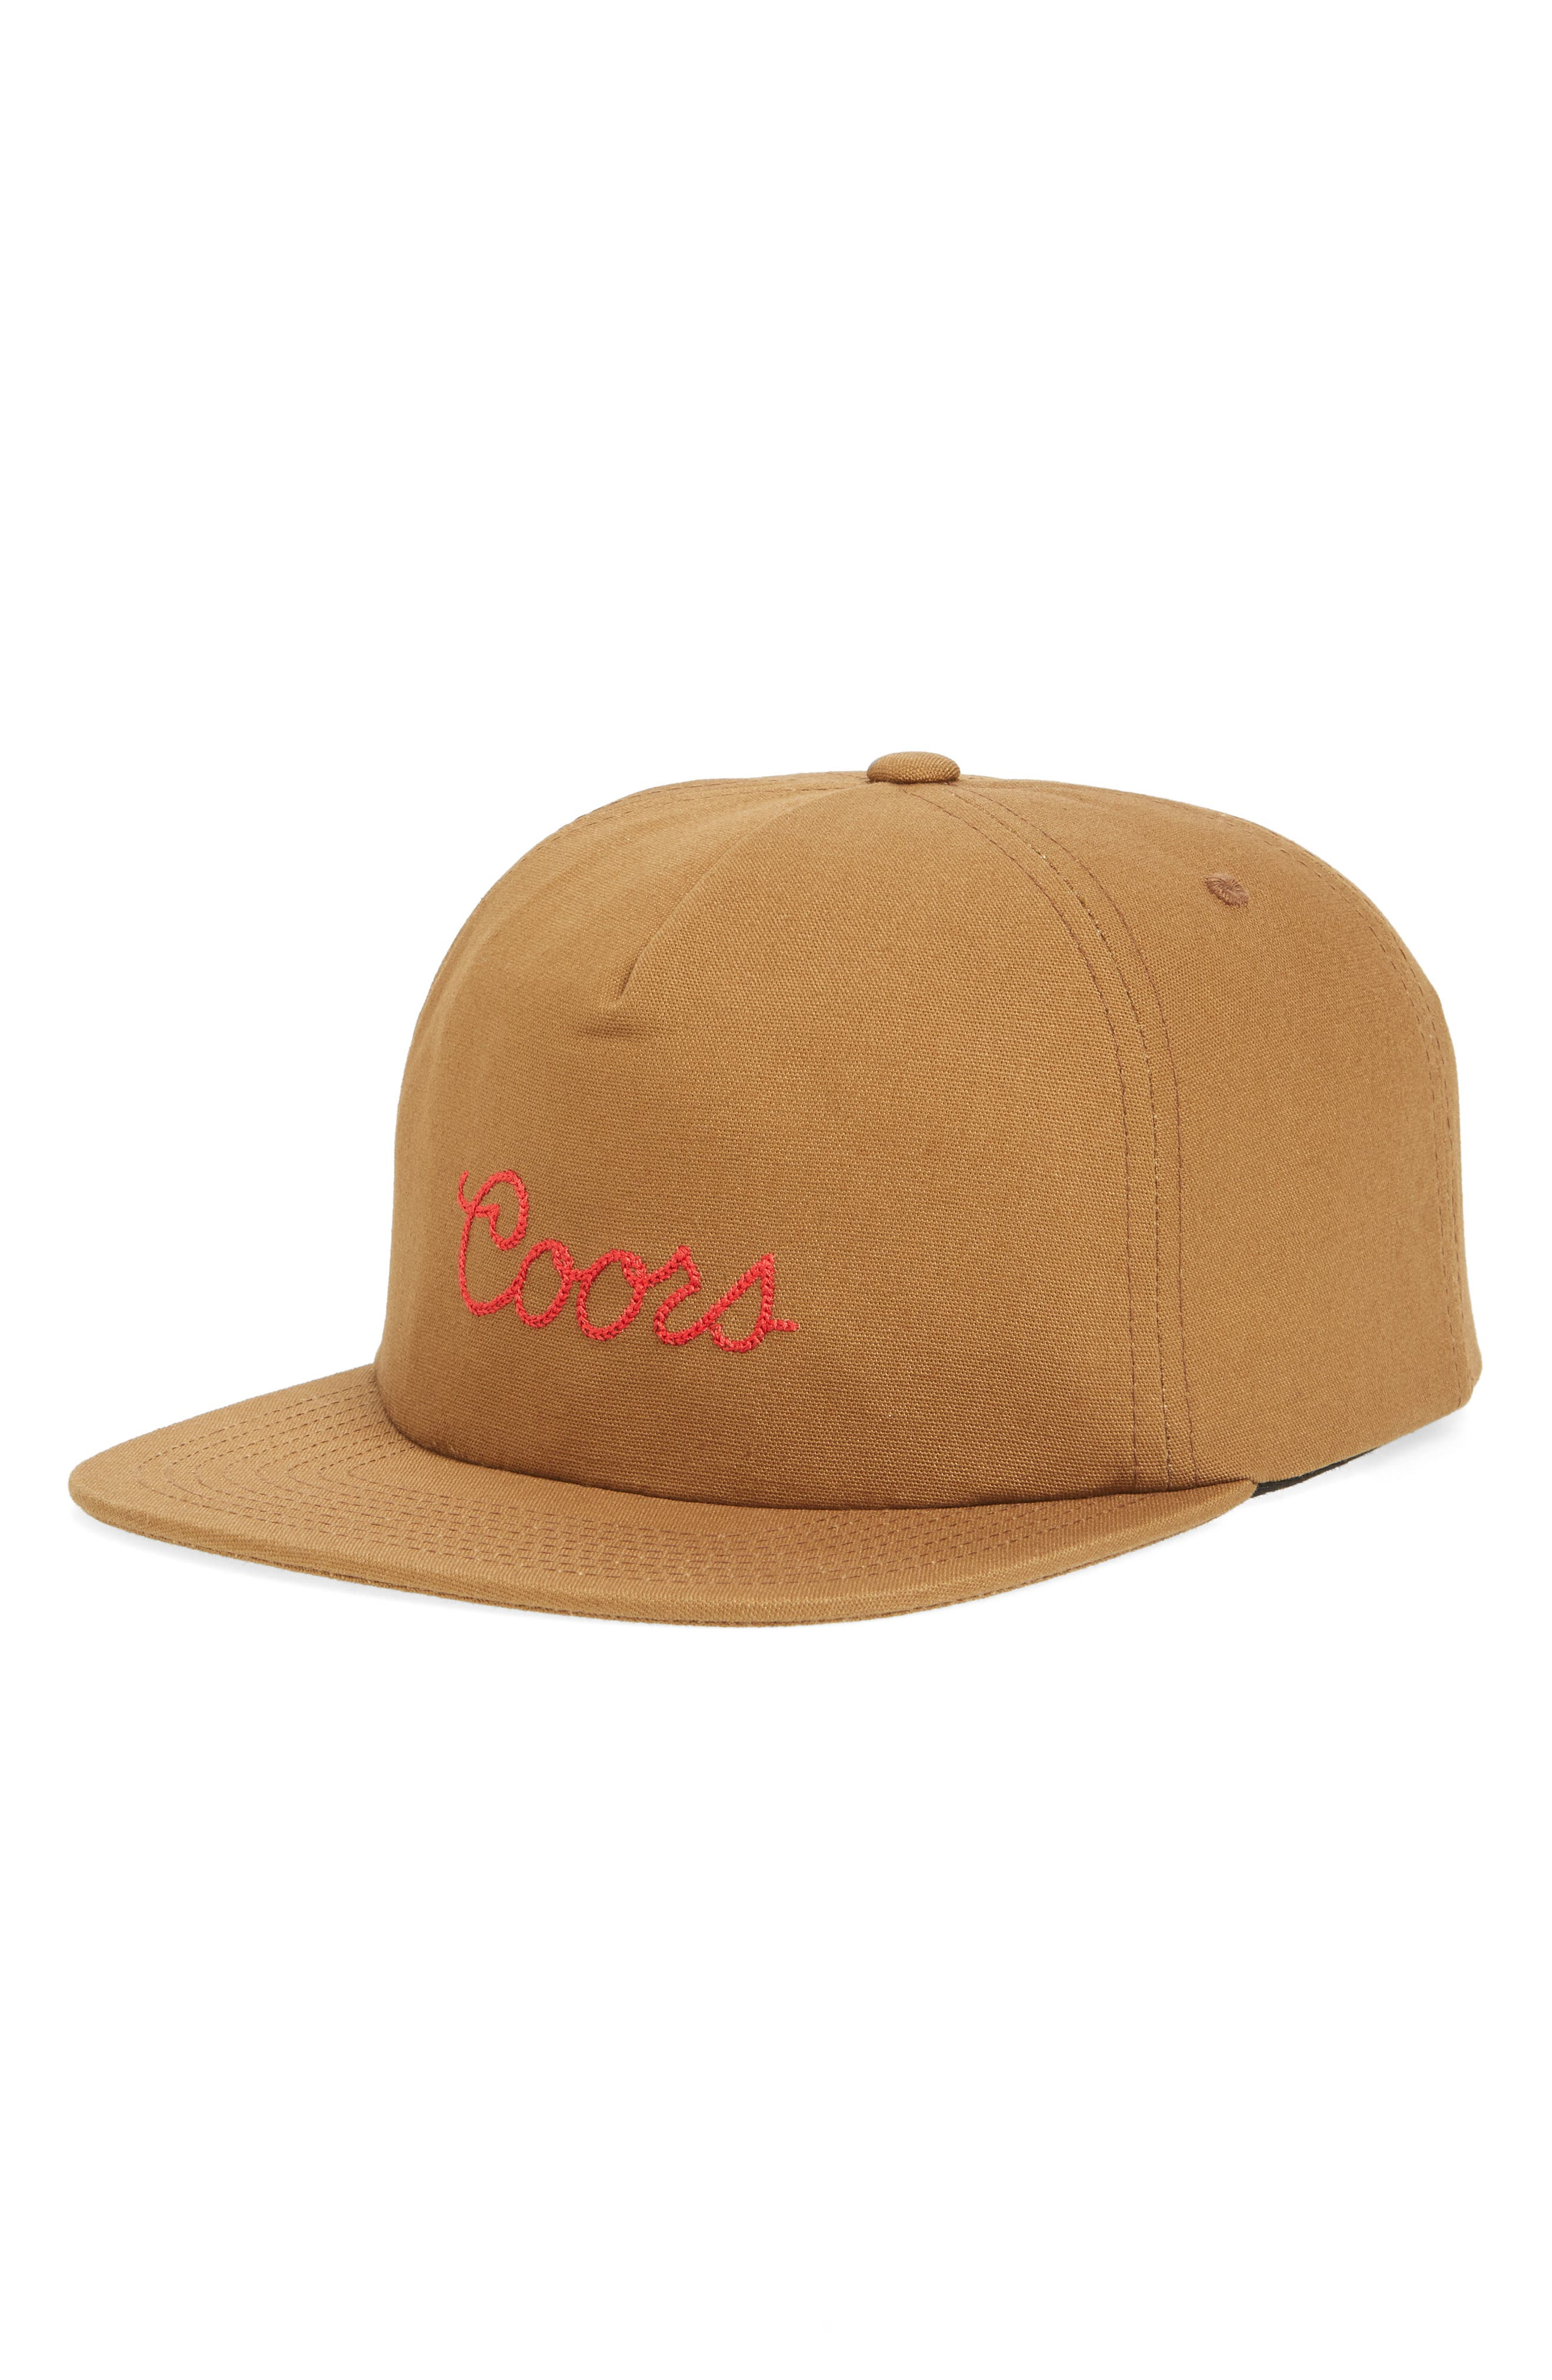 BRIXTON Coors Roping Logo Cap, Main, color, 200